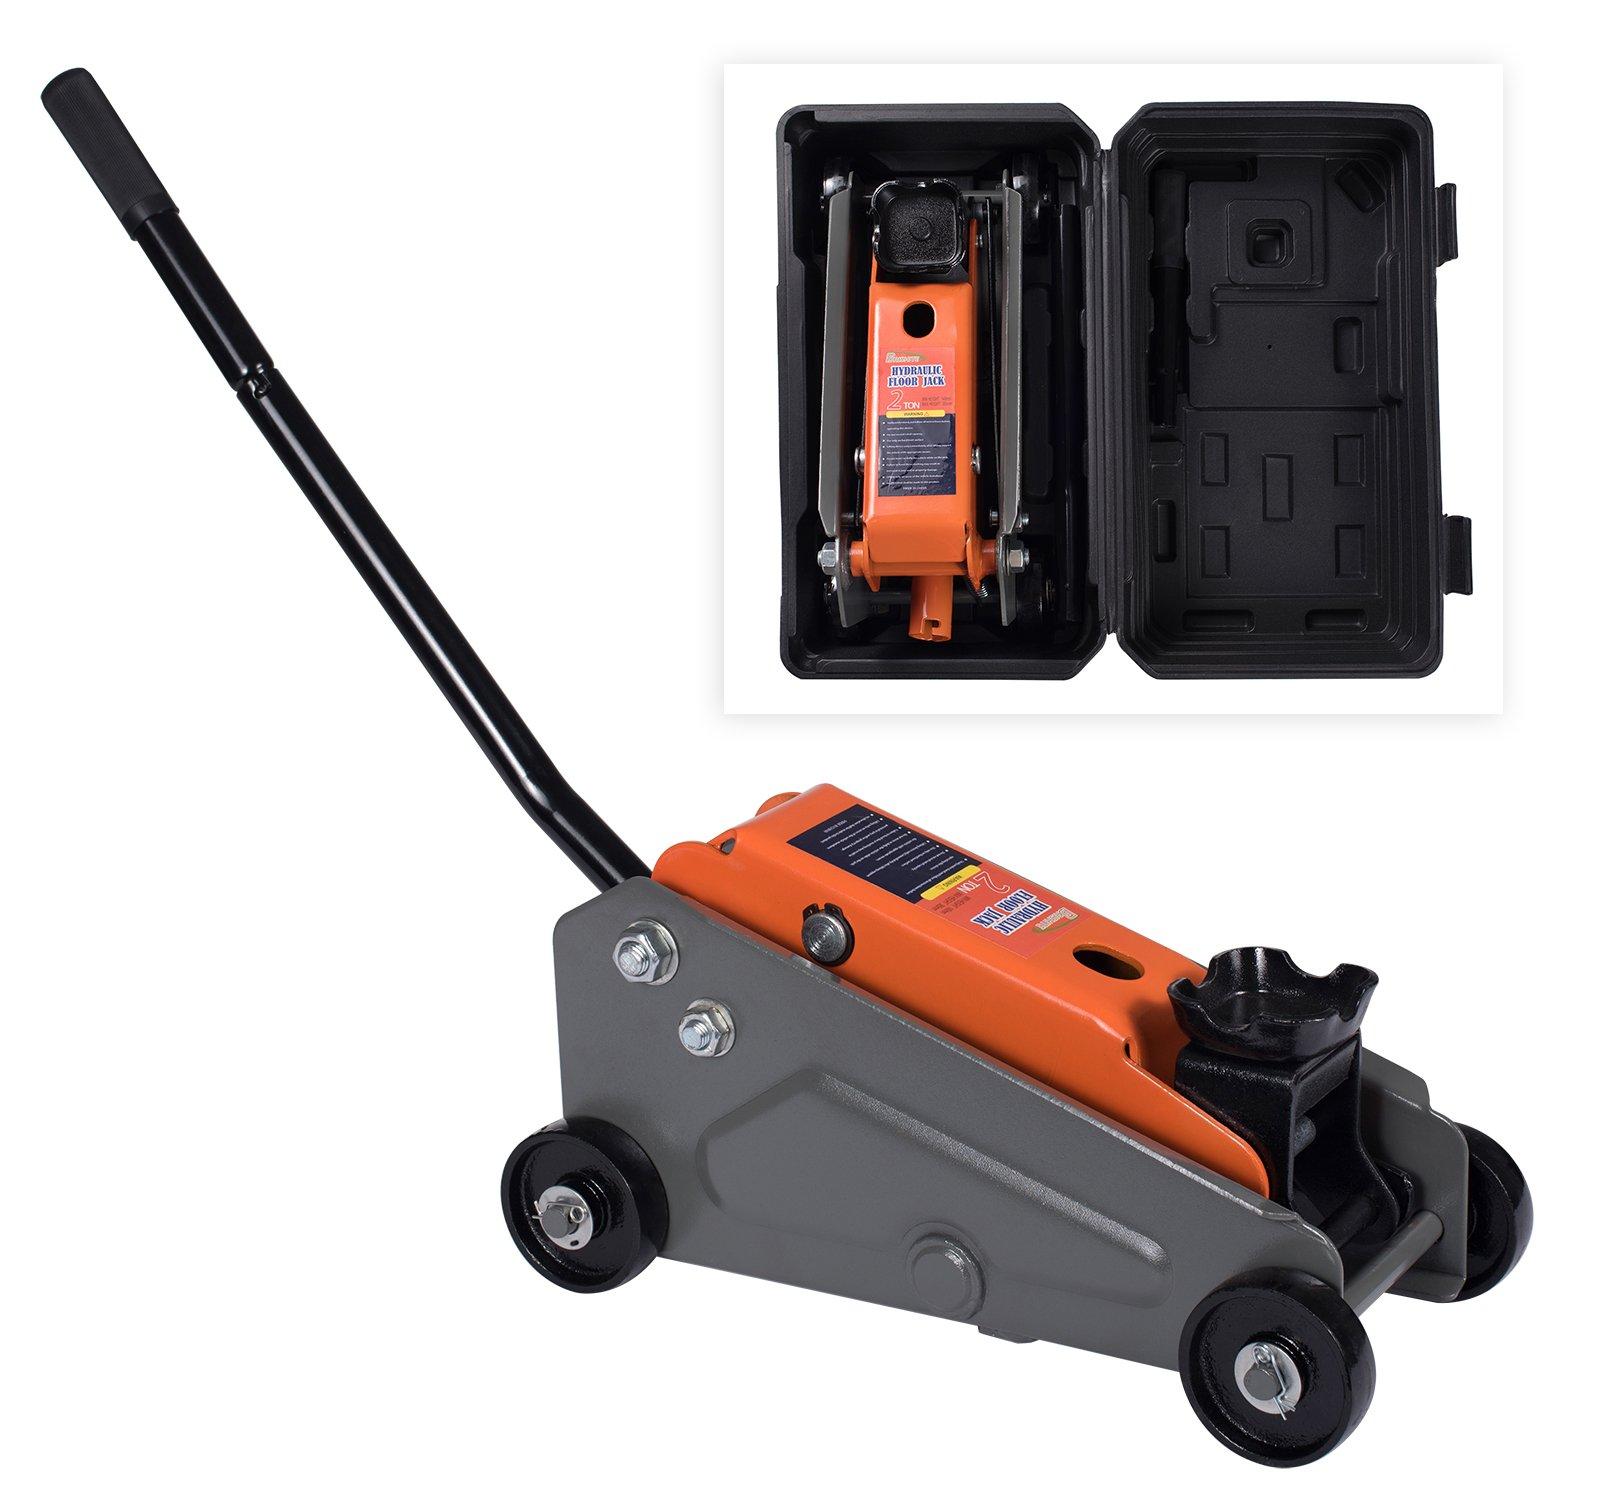 BAISHITE Hydraulic 2 Tons Capacity Floor Jack with Portable Blow Mold Case